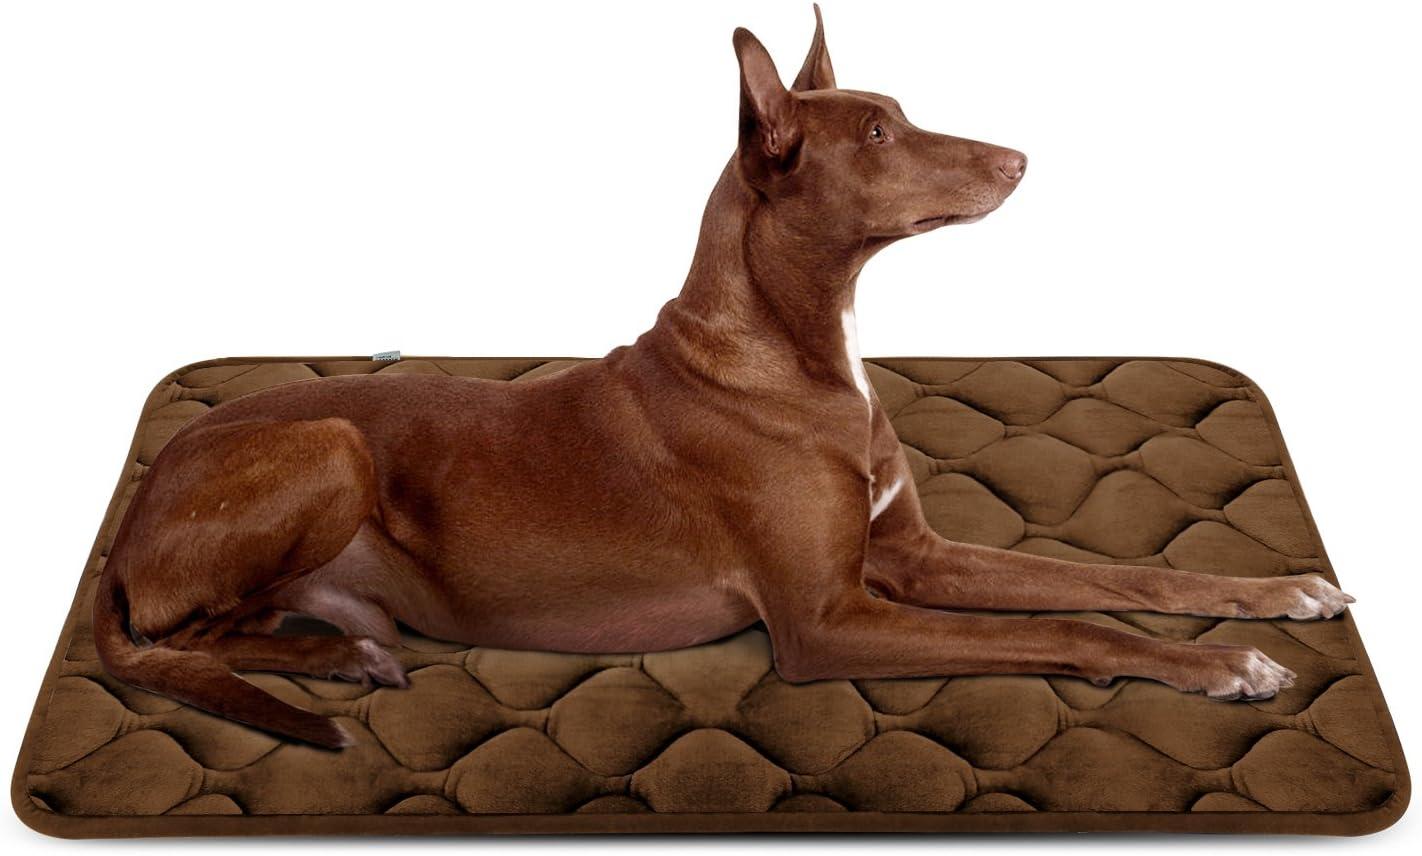 Hero Dog Cama Colchoneta Perro Grande Lavable, Cojines para Mascotas Antideslizante Vellón Almohadilla Suave 107x70 cm (Café L)